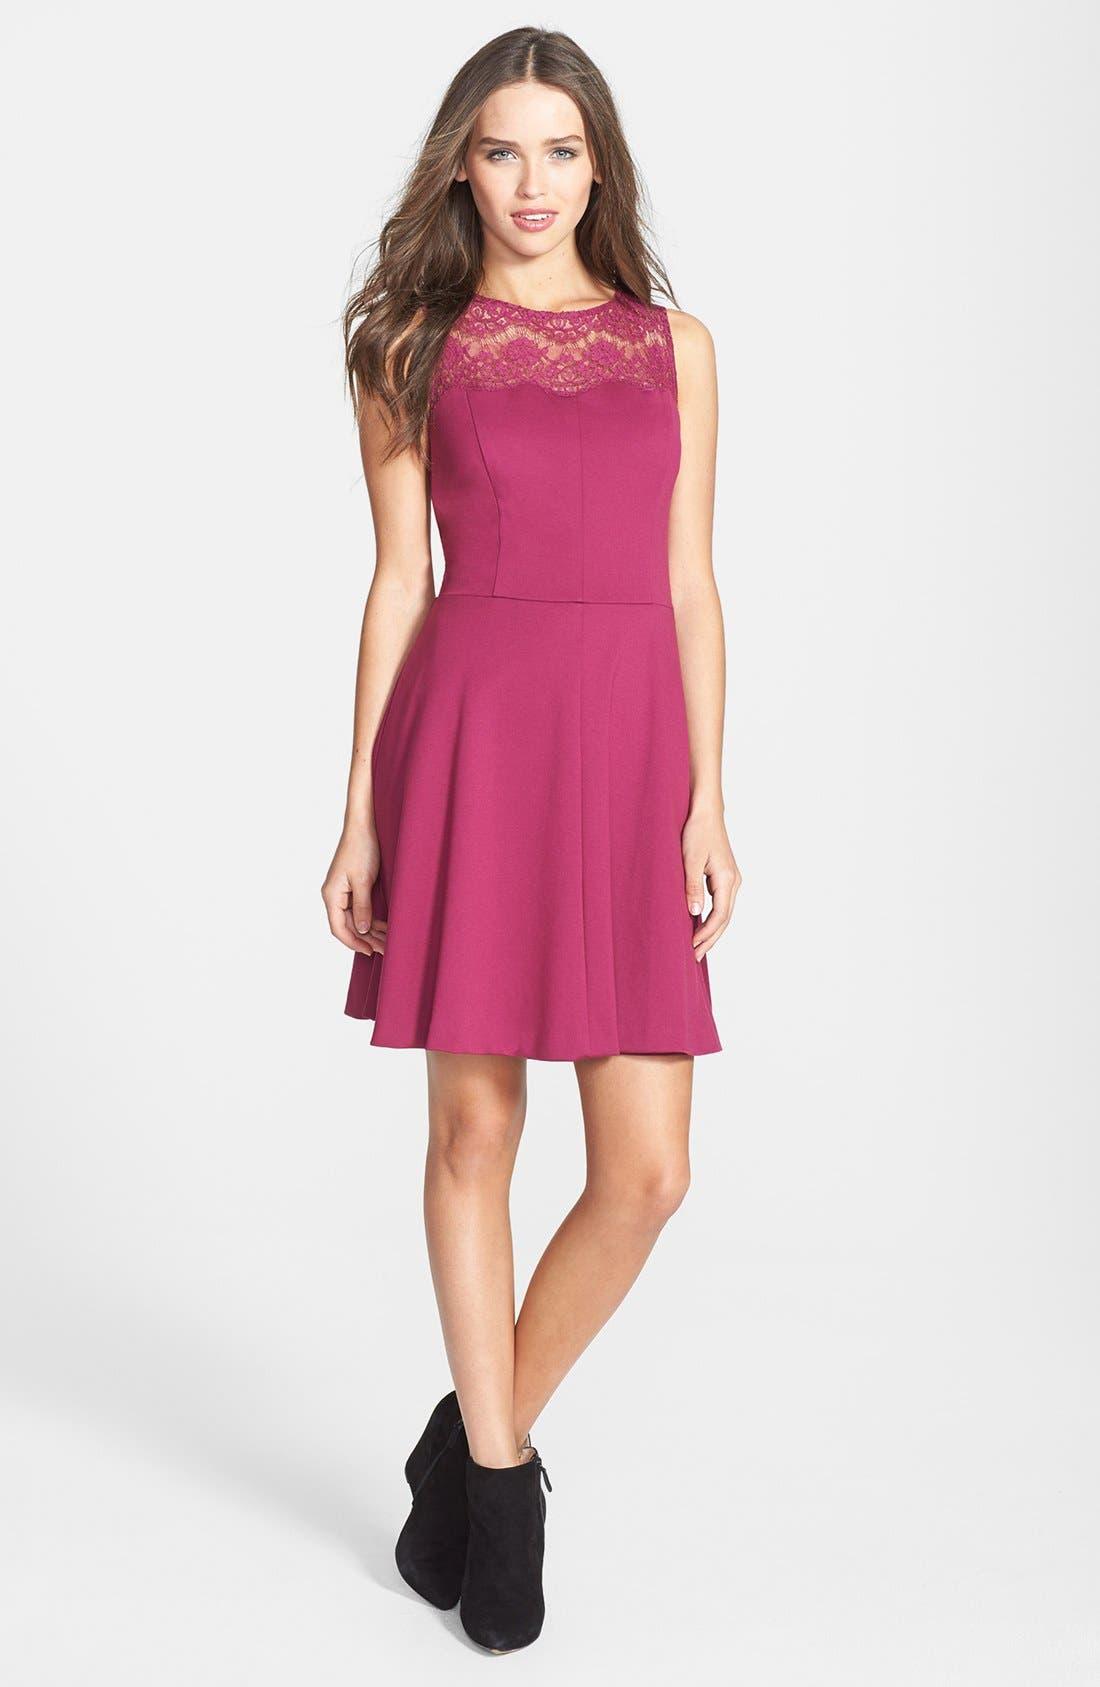 Main Image - Jessica Simpson Lace Yoke Ponte Fit & Flare Dress